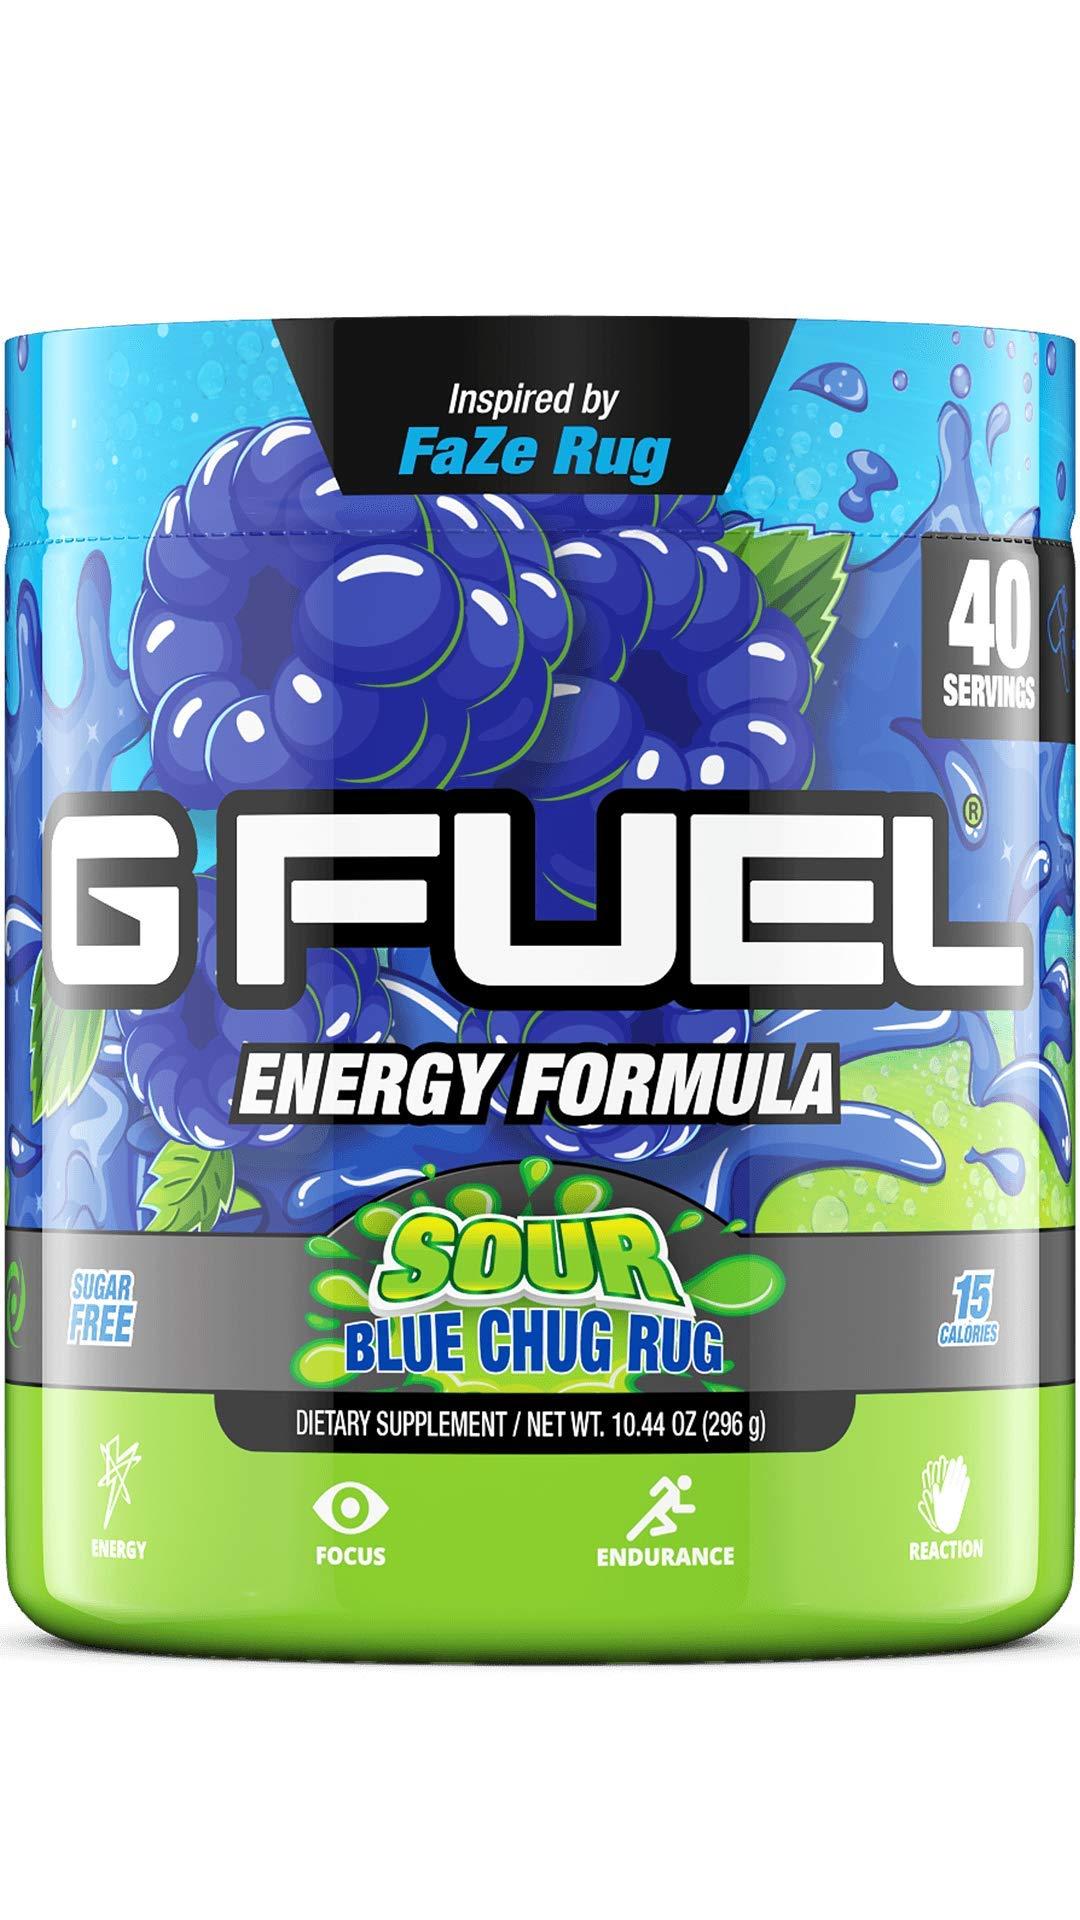 G Fuel Sour Blue Chug Rug Tub (40 Servings) Elite Energy and Endurance Powder Inspired by Faze Rug 10.44 oz.